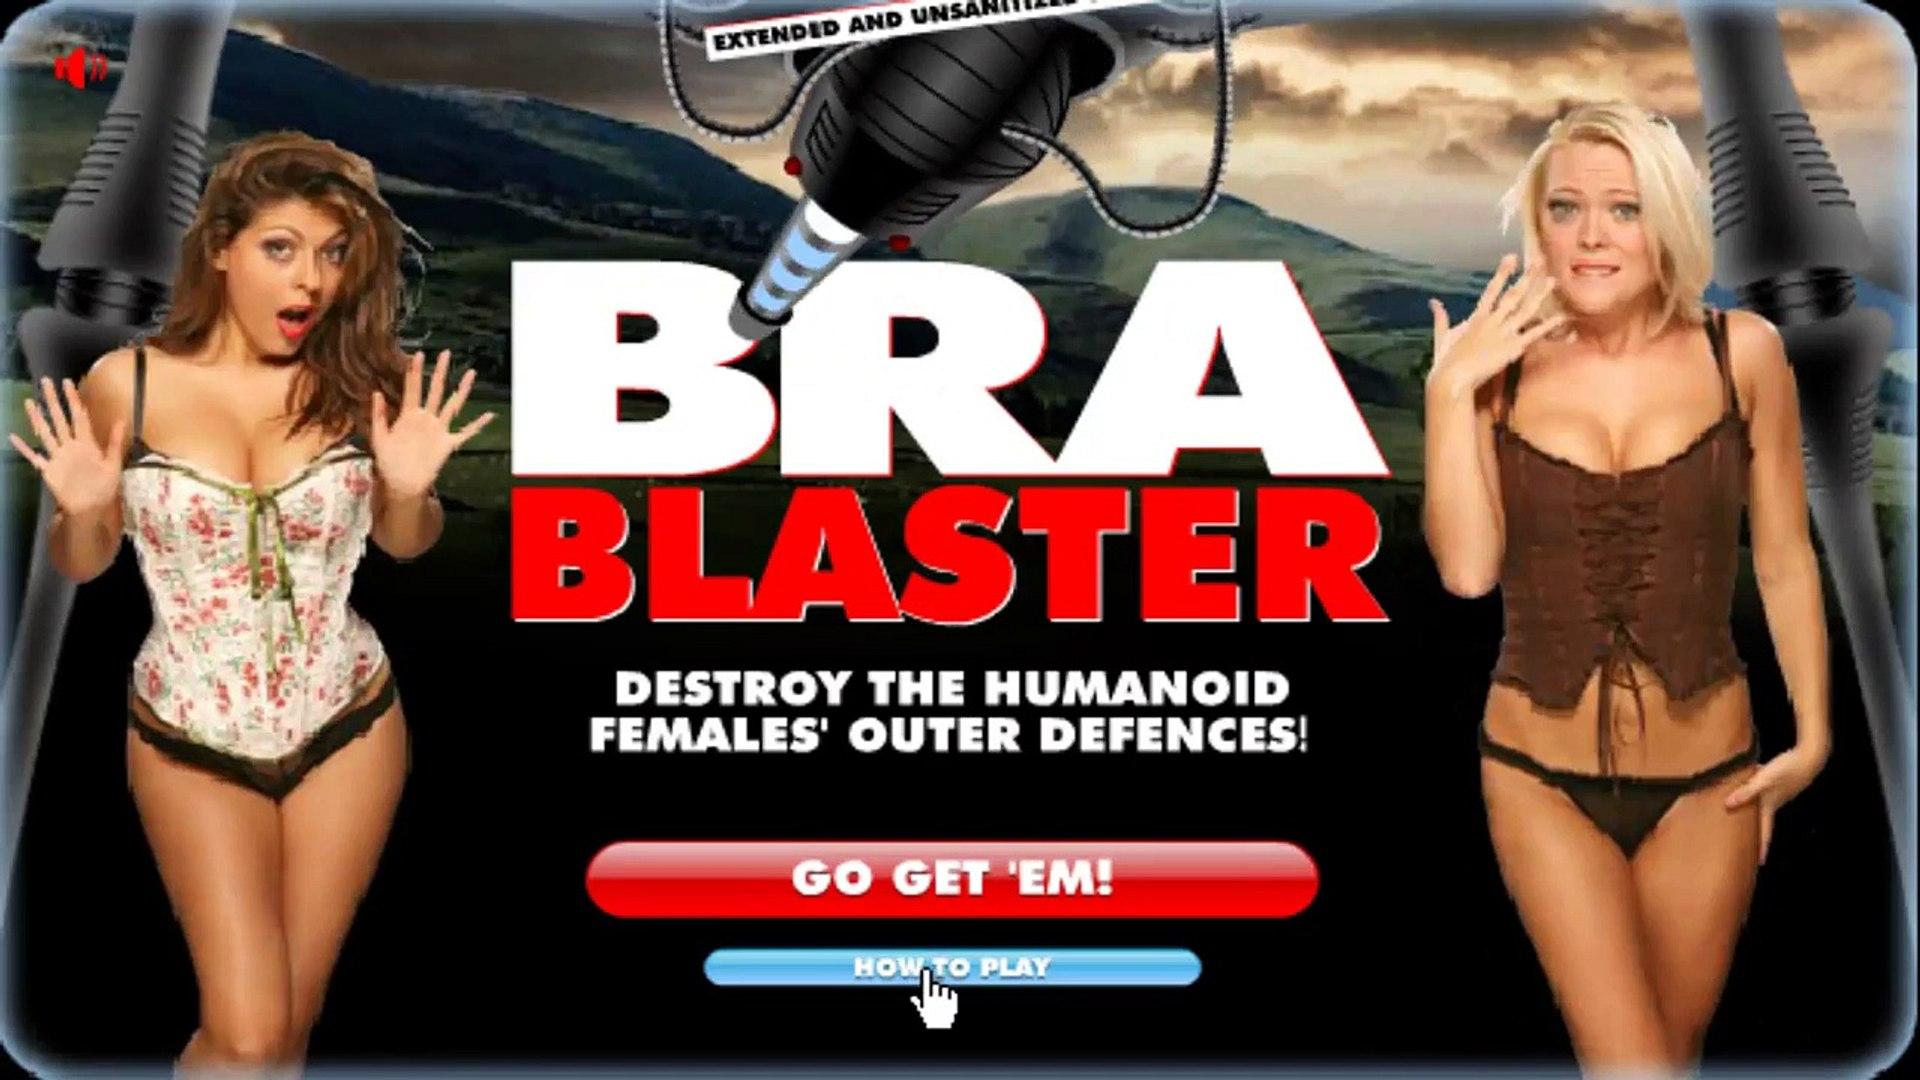 Bra Blaster Girls